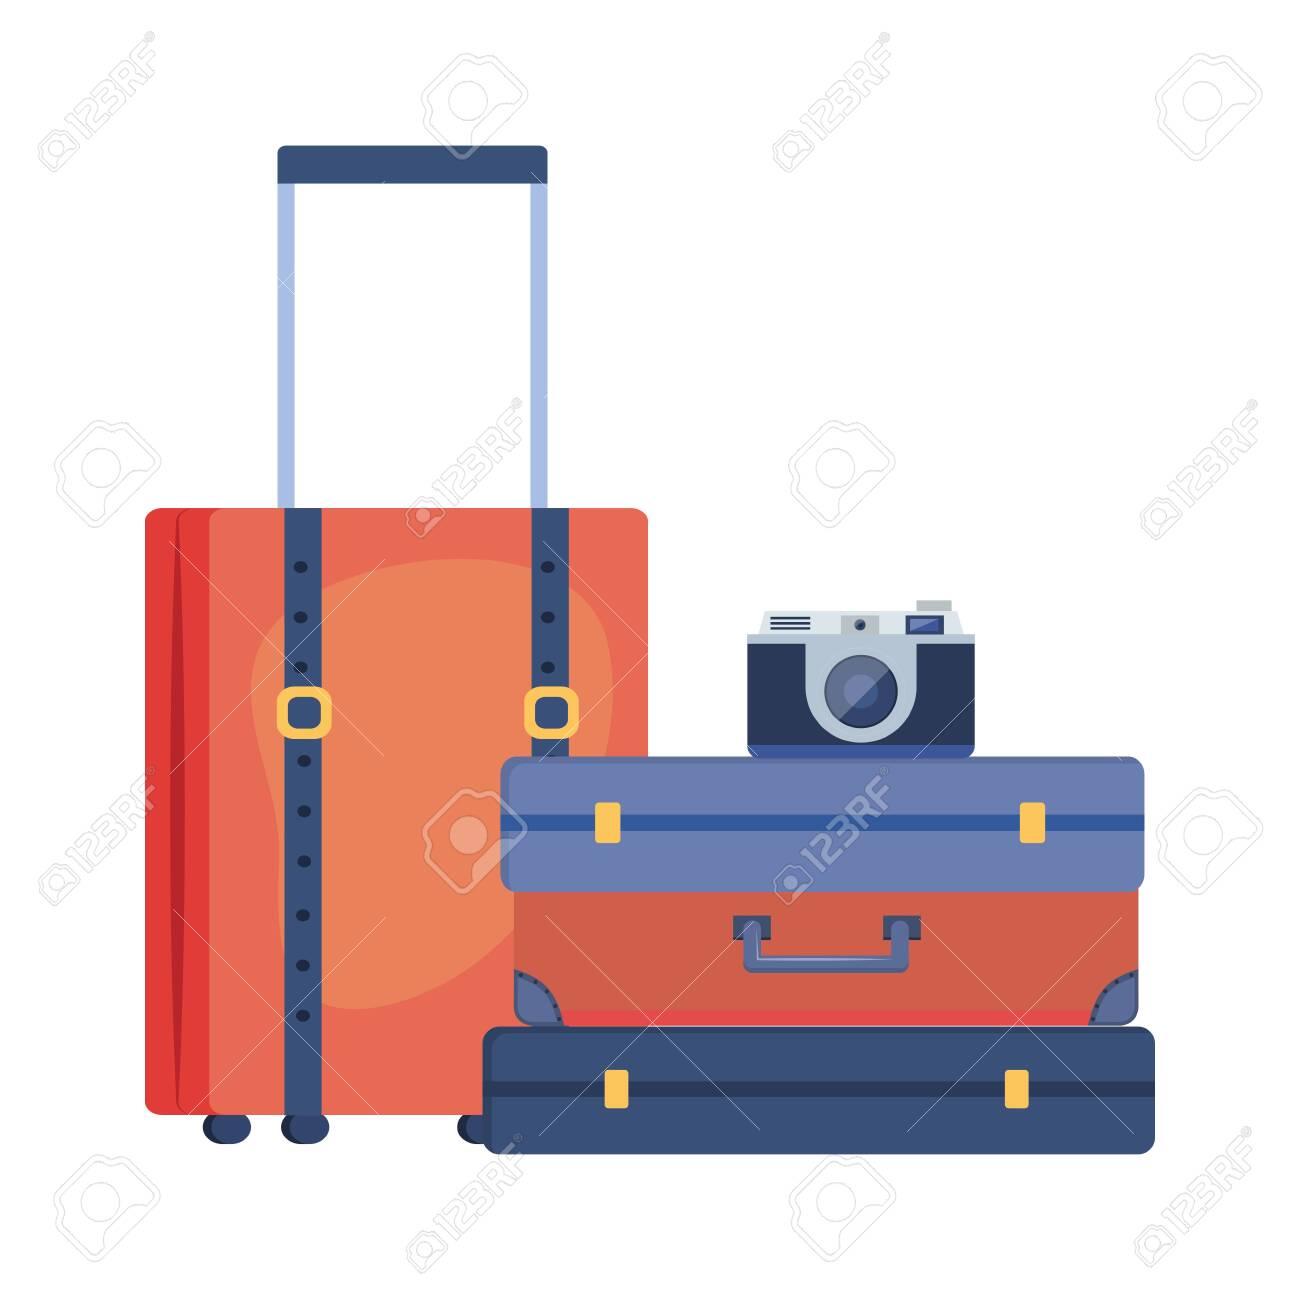 Suitcase and travel design - 128343930